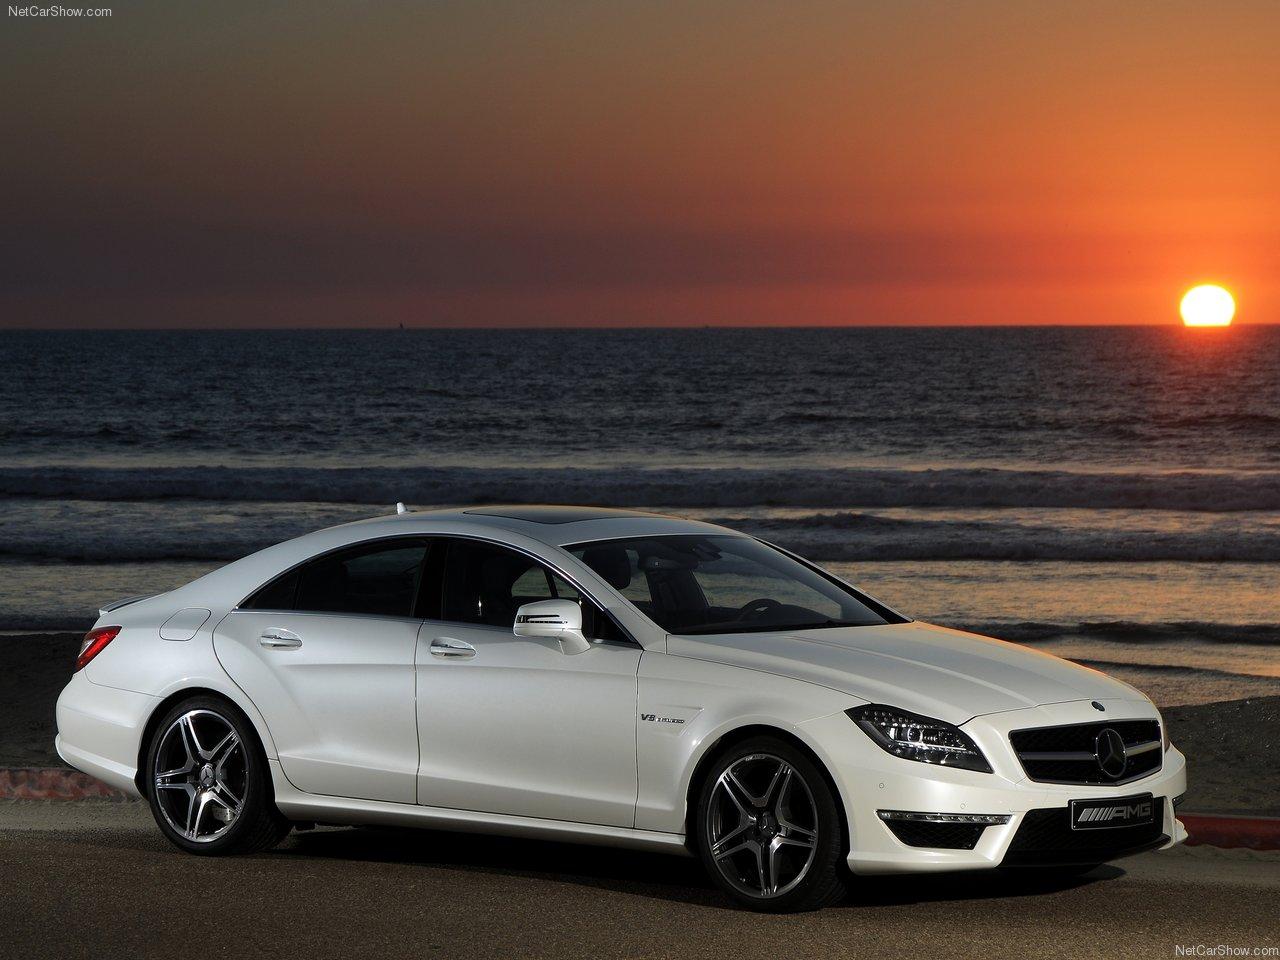 http://1.bp.blogspot.com/-tfQYx91Xs_0/TWiaCmXANzI/AAAAAAACLJE/OkS0-ypYvd0/s1600/Mercedes-Benz-CLS63_AMG_US_Version_2012_1280x960_wallpaper_03.jpg